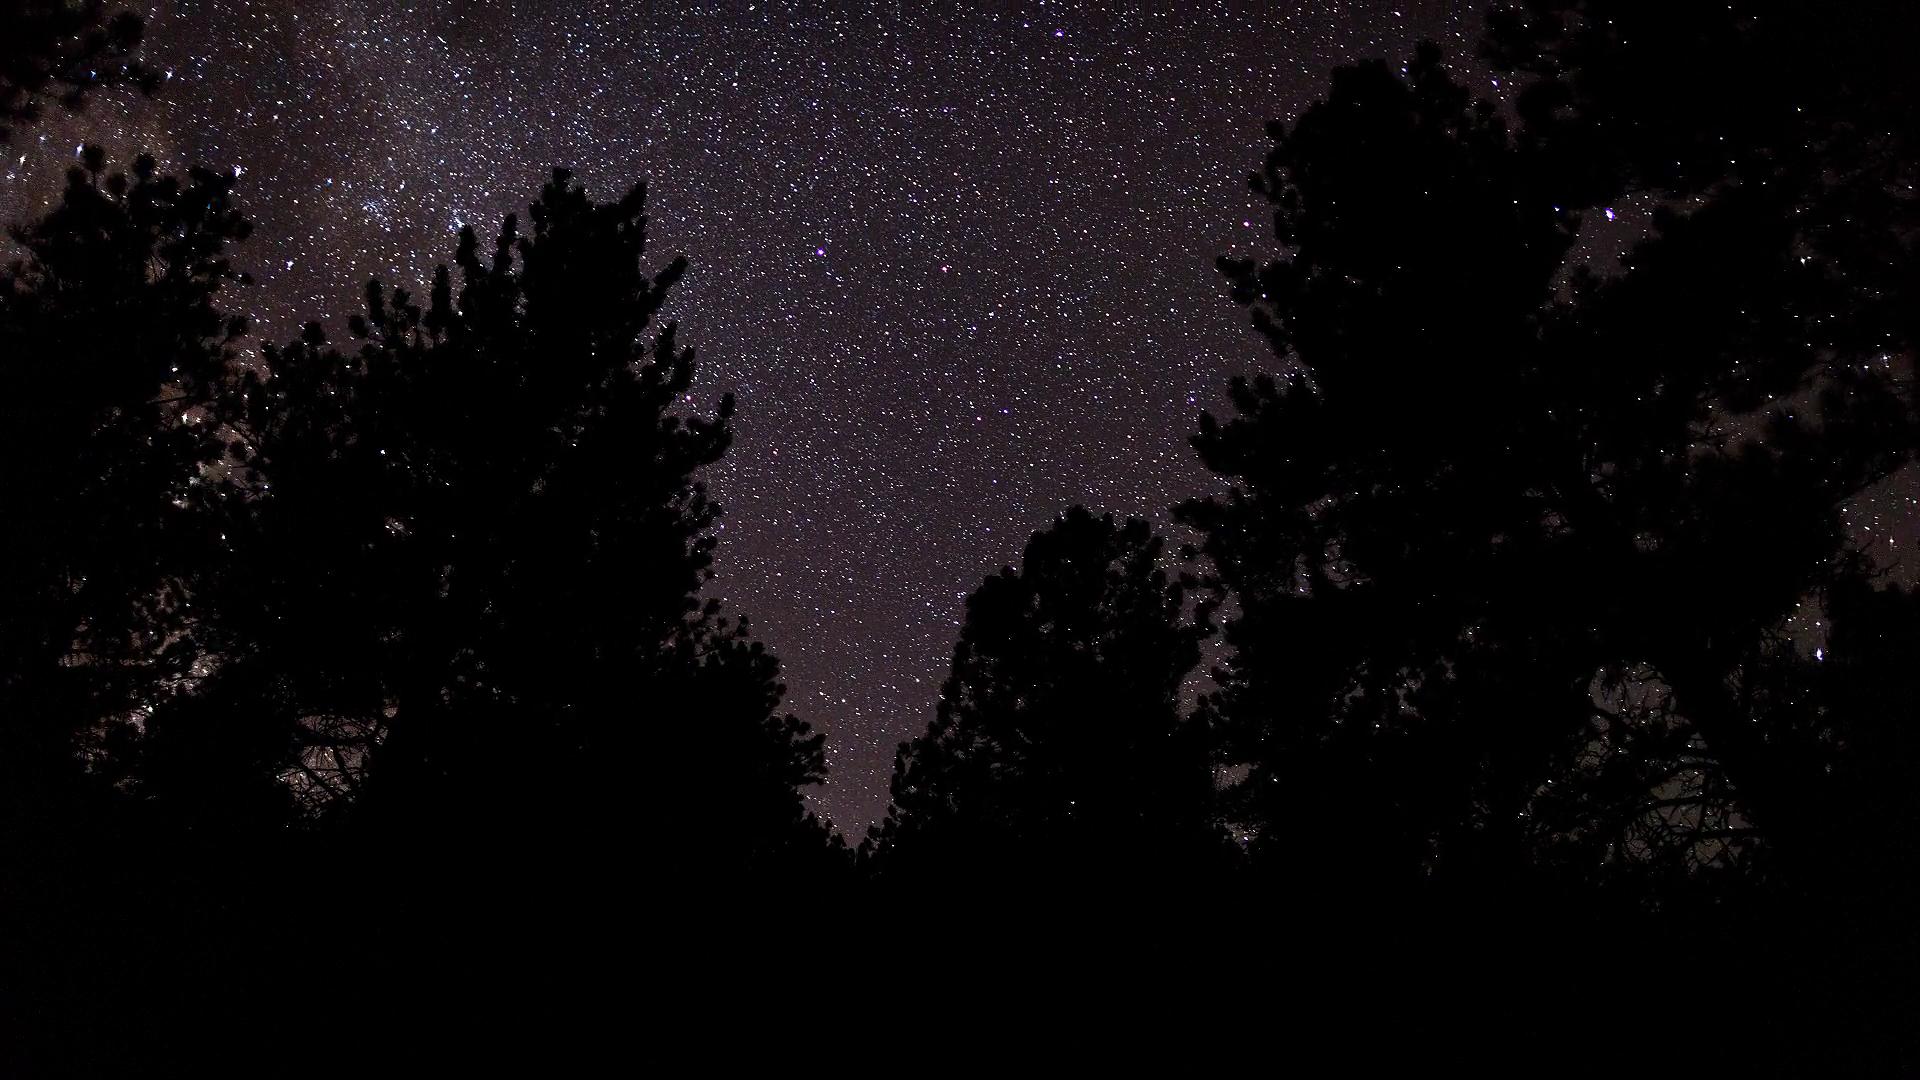 starry night sky wallpaper - photo #41